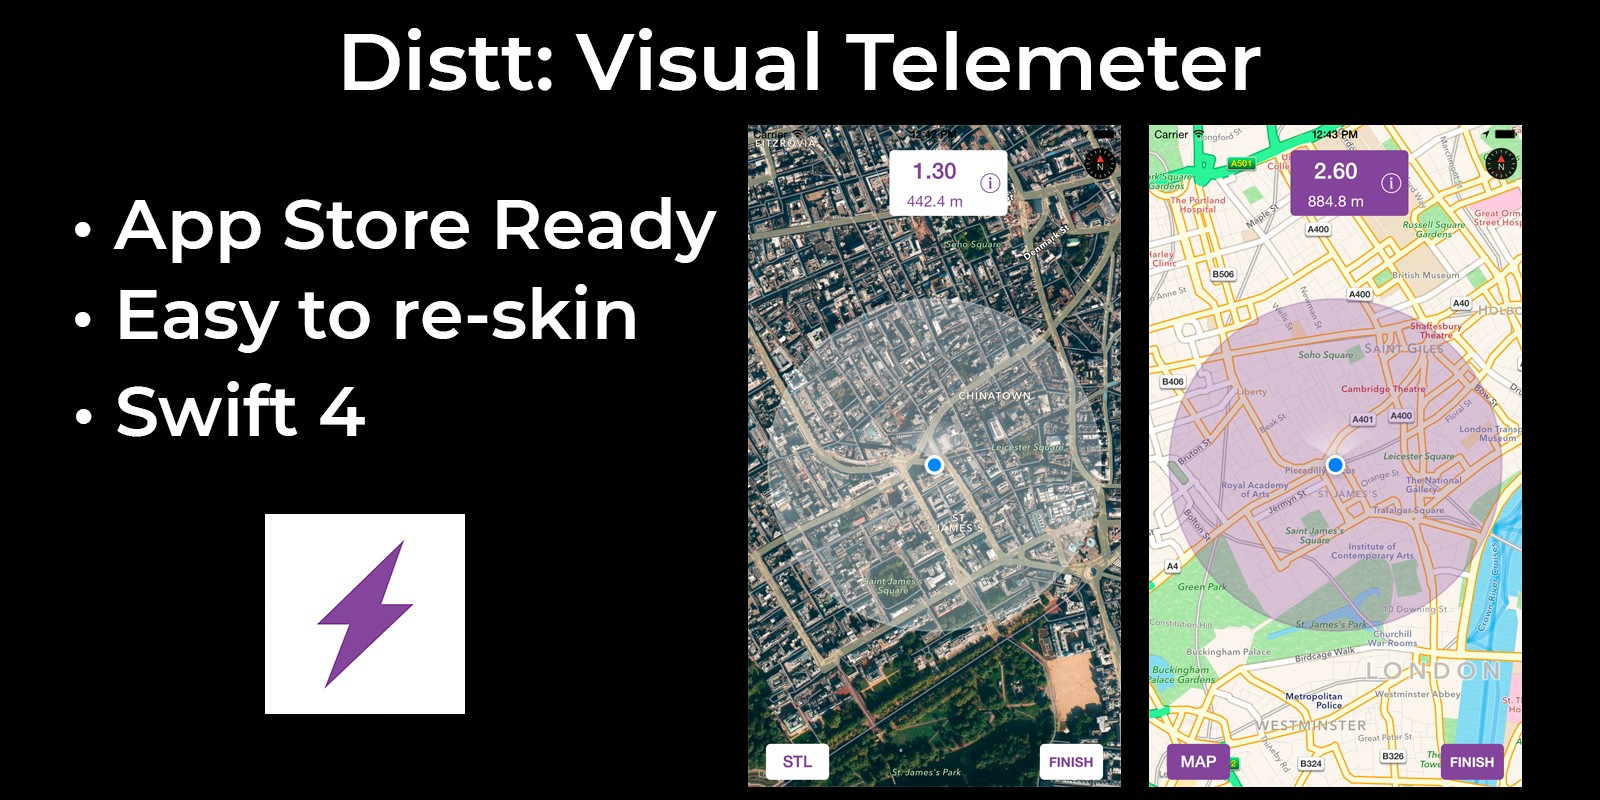 Distt Visual Telemeter - iOS Source Code